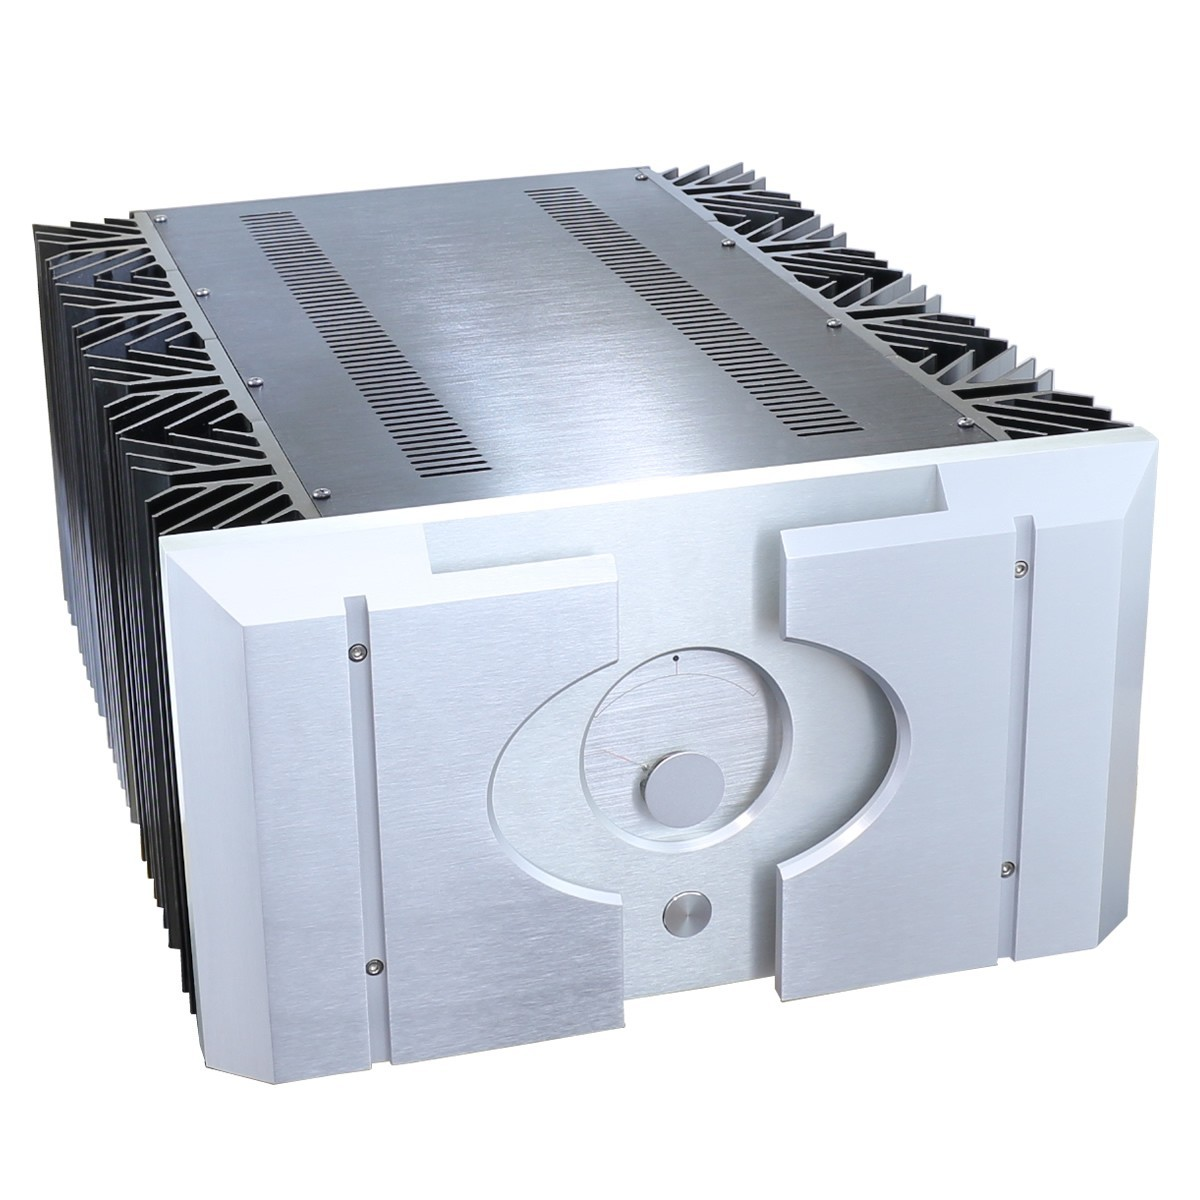 100% Aluminium DIY Box / Case with Vu-meter for Audio Amplifier  620x480x260mm